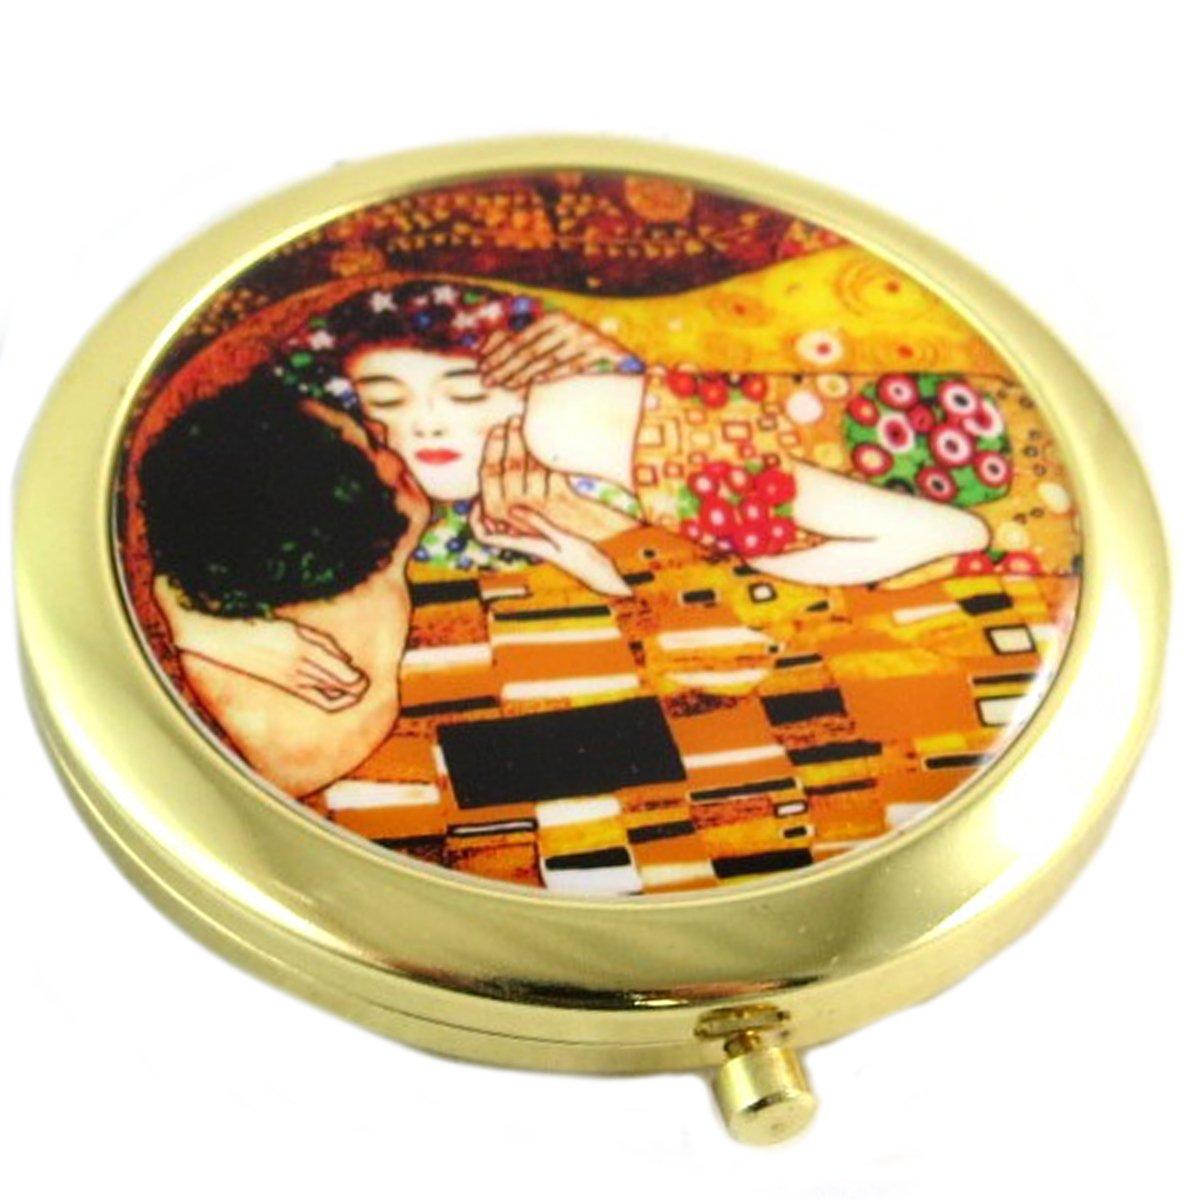 Les Tré sors De Lily [Q0178] - Collector mirror 'Gustav Klimt' (the kiss)- 7 cm (2.76''). Les Tresors de Lily 040801FAN062018Q017800